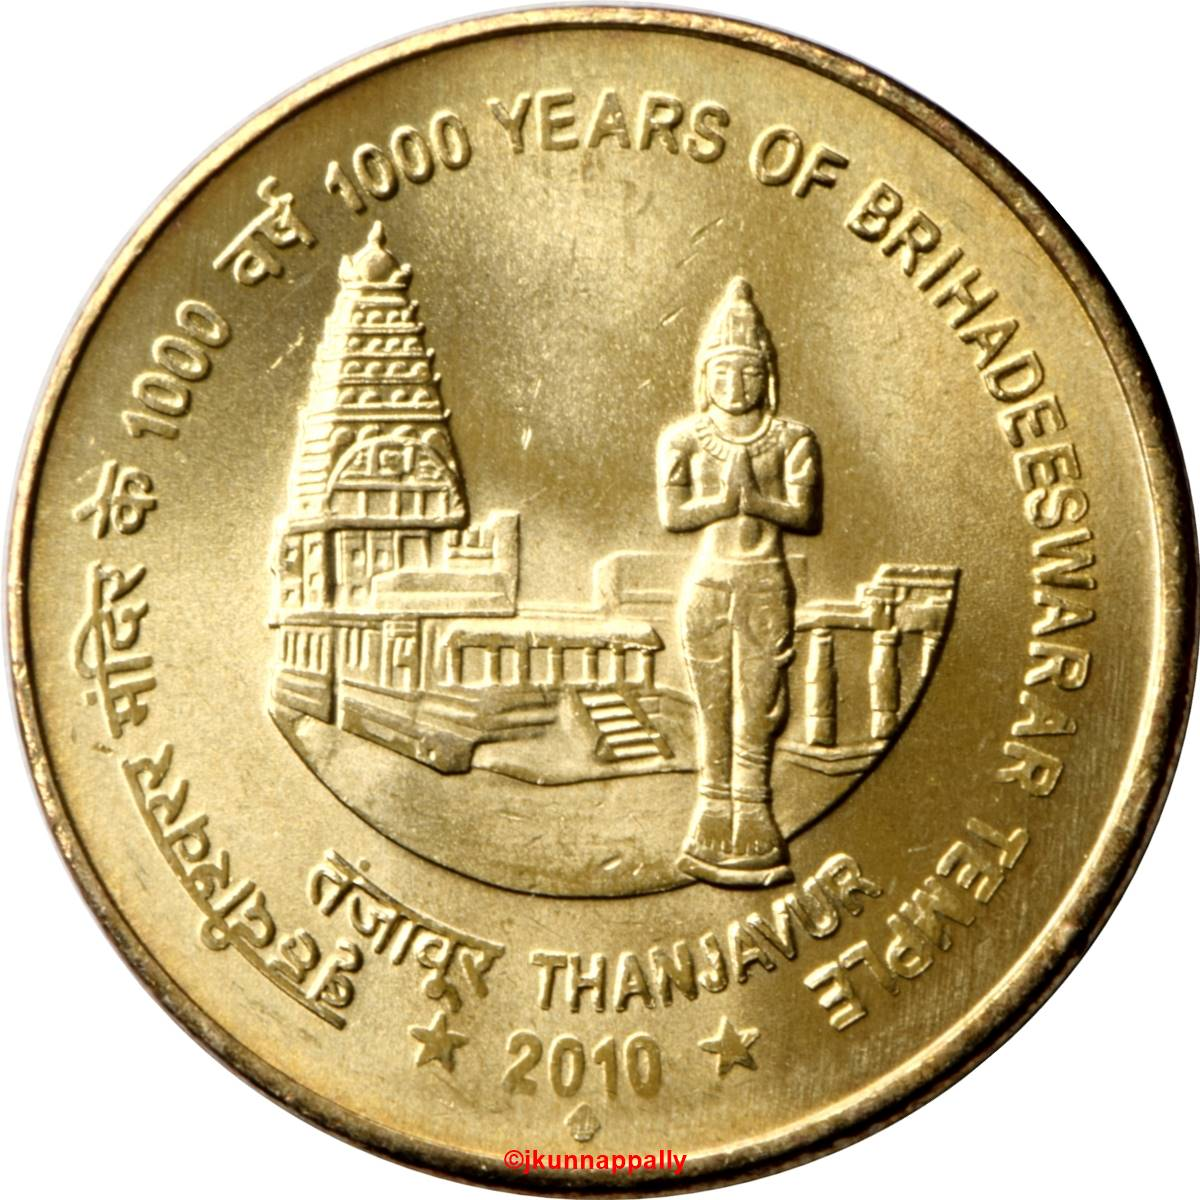 India 5 rupees 2010 1000 years of the Brihadeswarar Thanjavur temple #4579